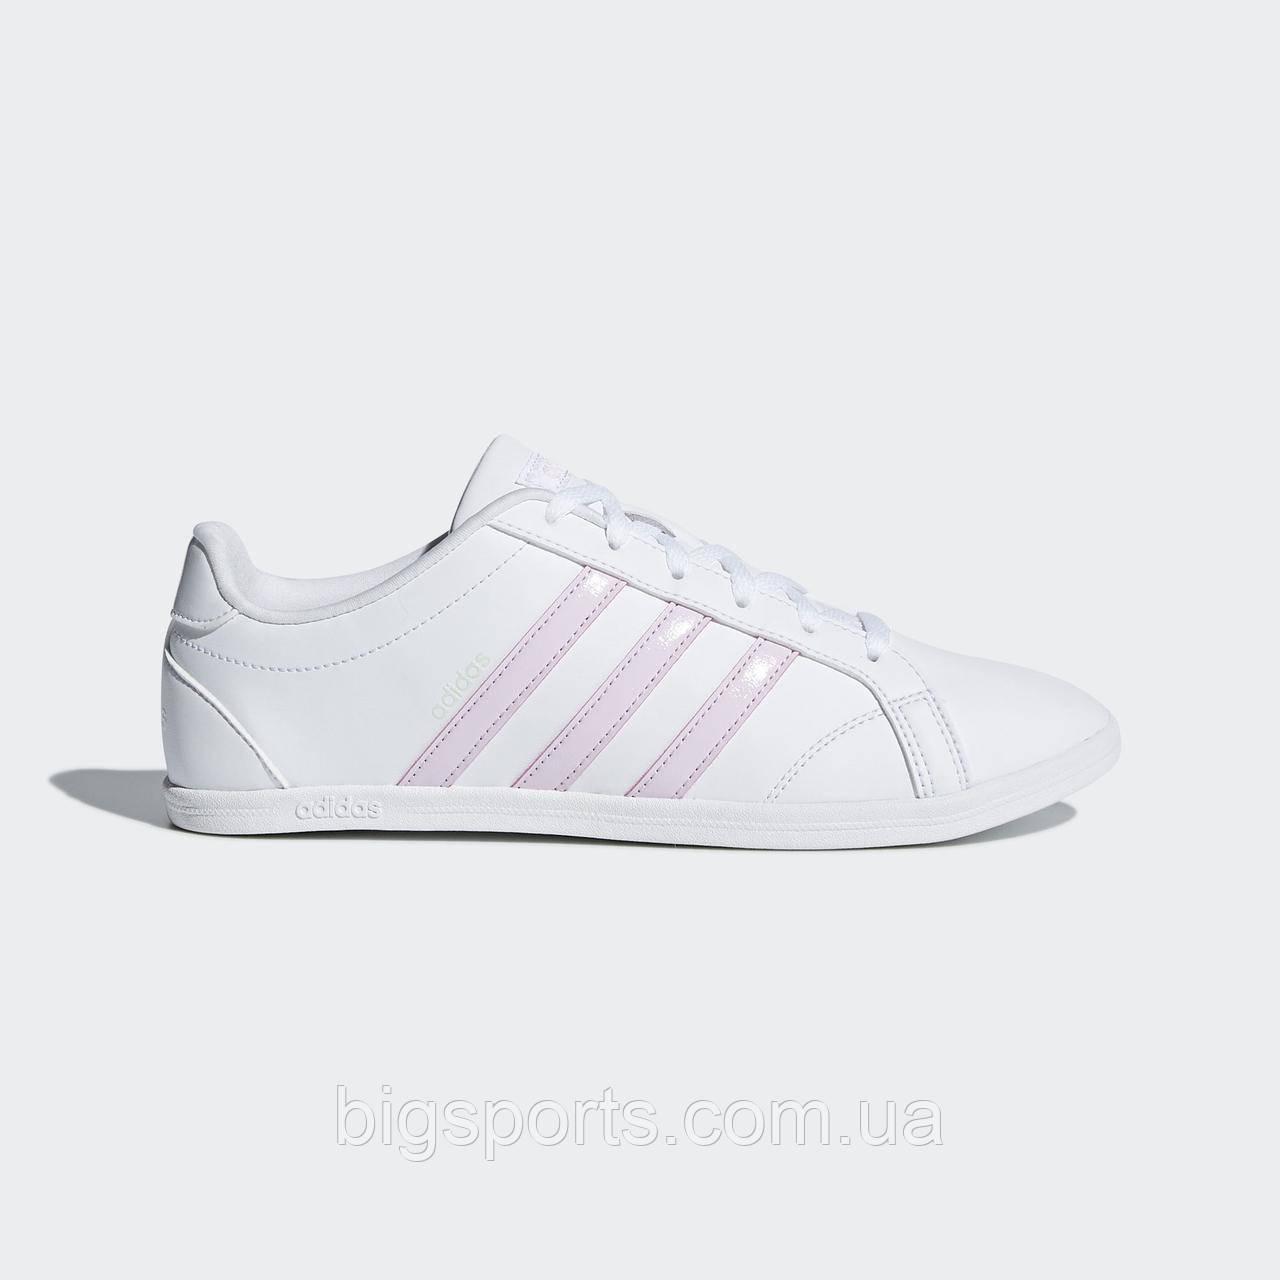 Кроссовки жен. Adidas Coneo QT (арт. DB0132)